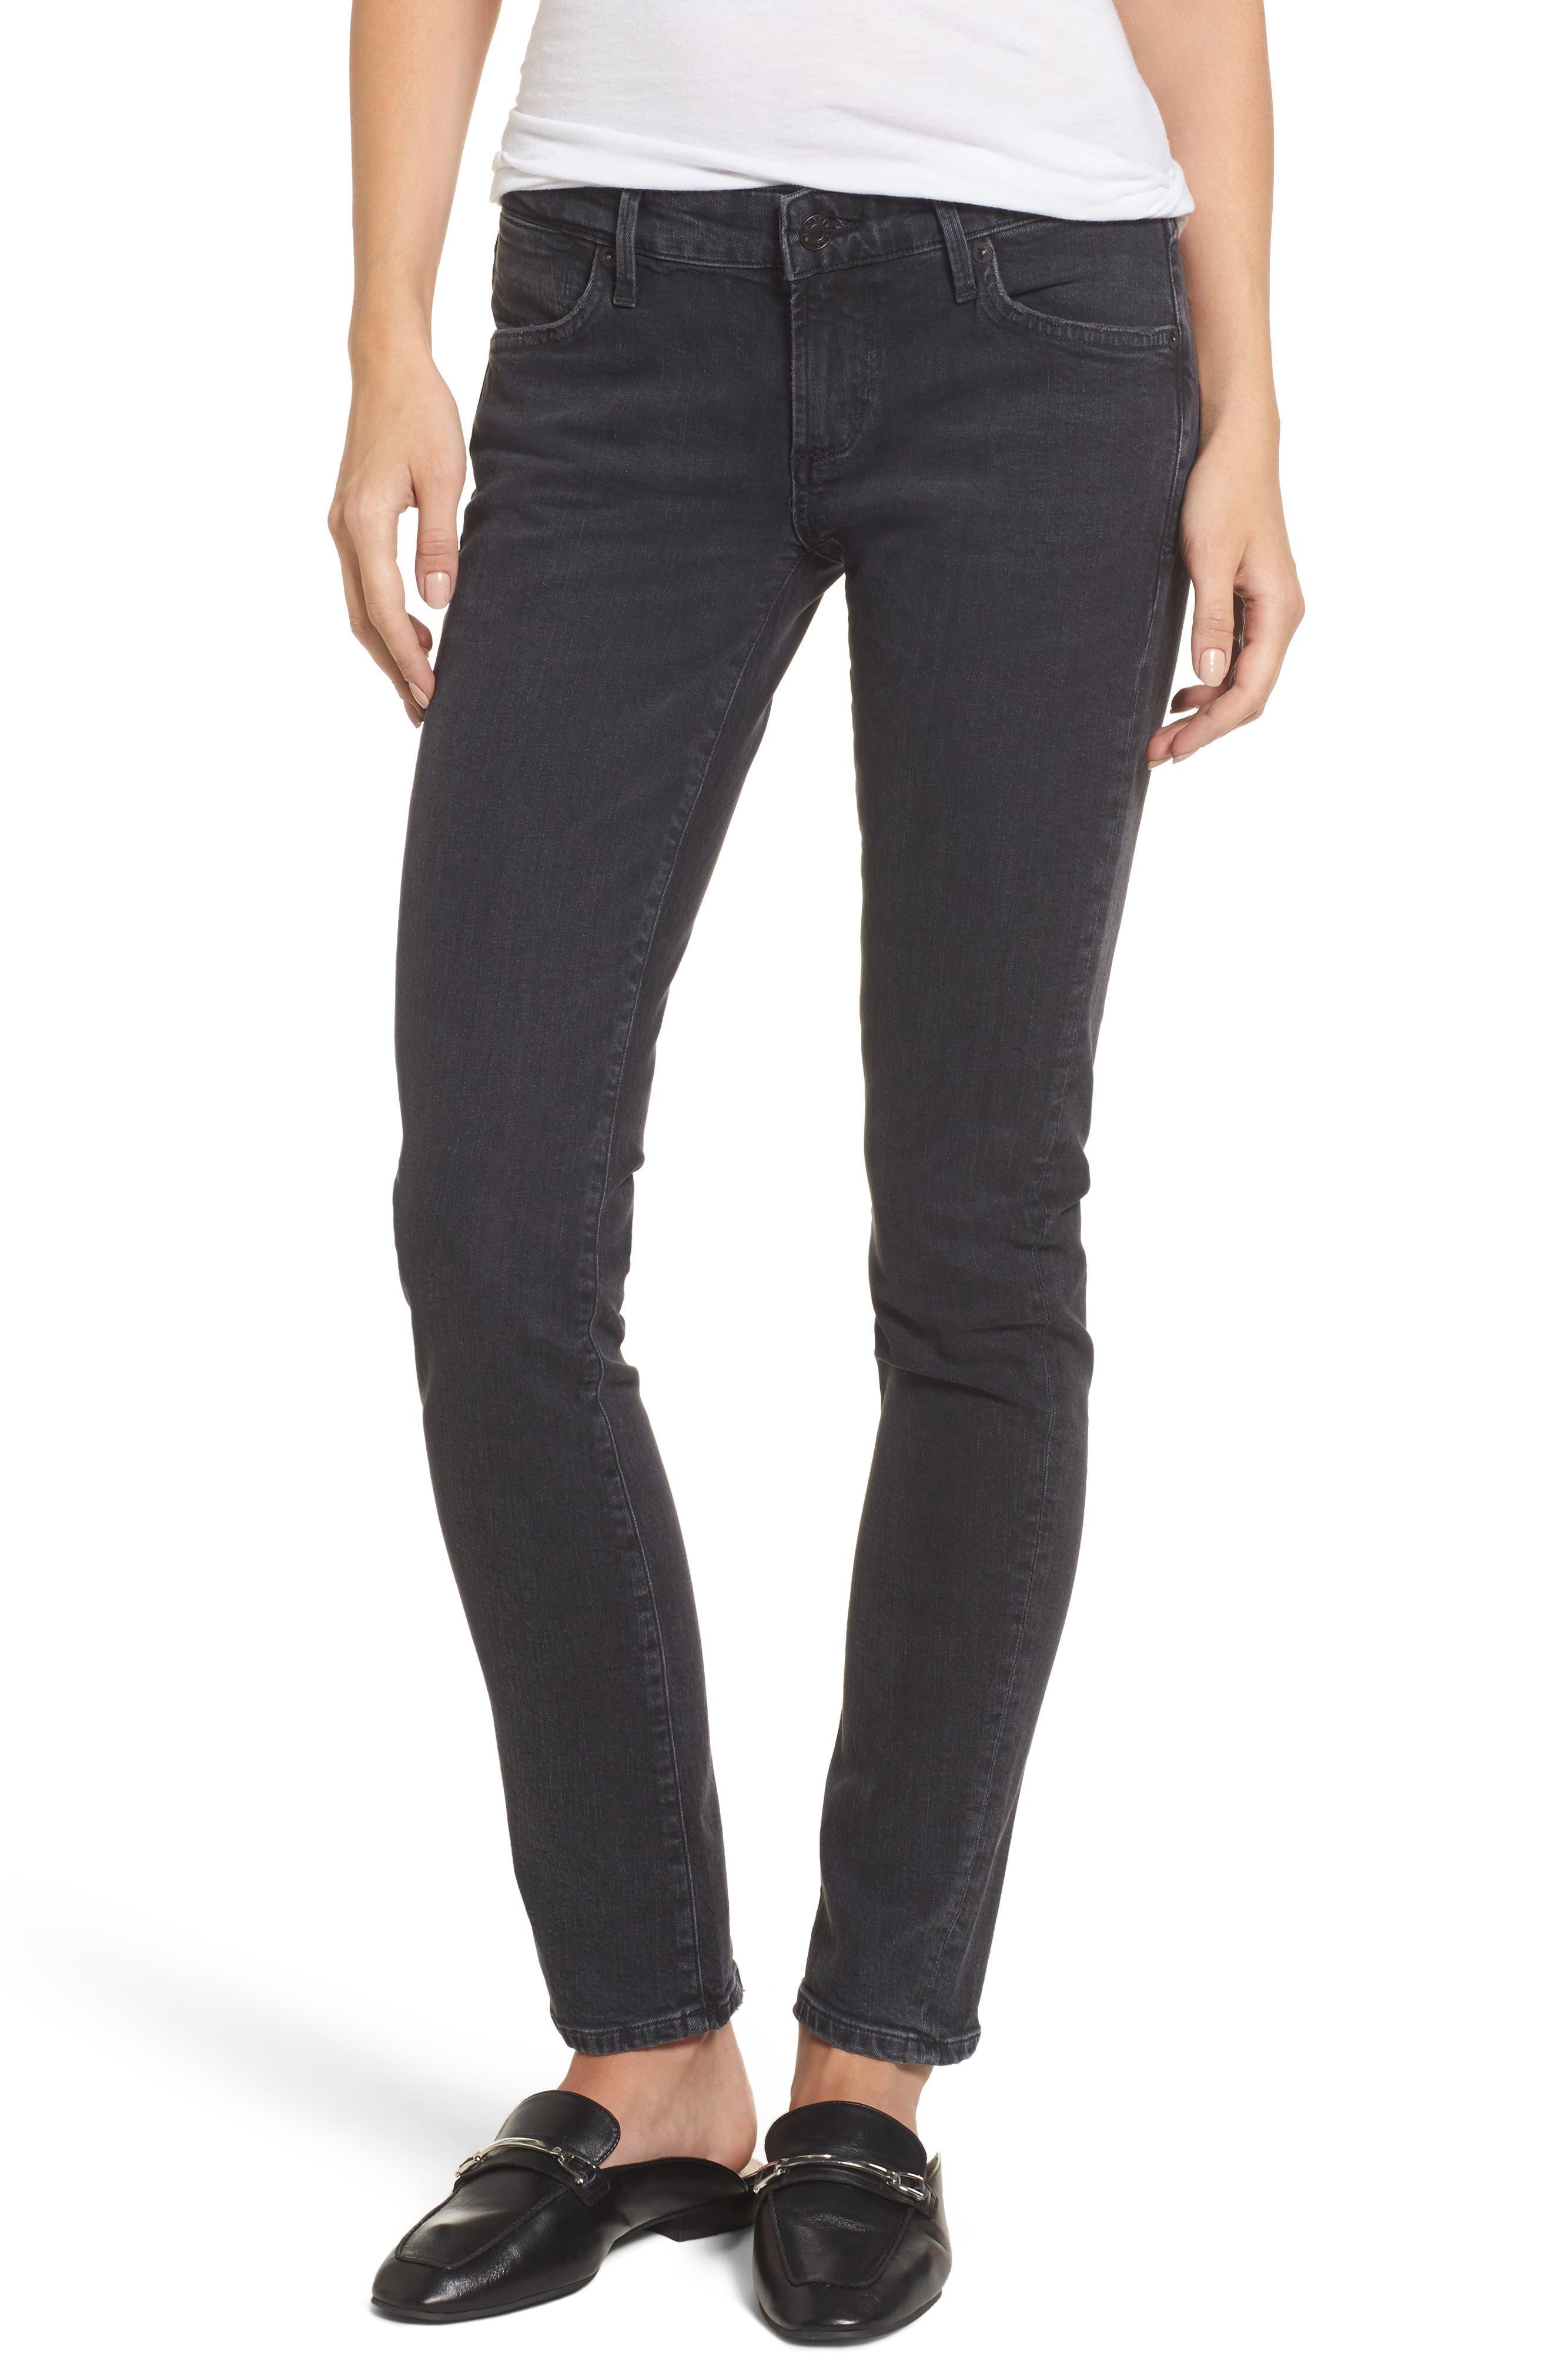 Chloe Low Rise Slim Jeans,                         Main,                         color, 072